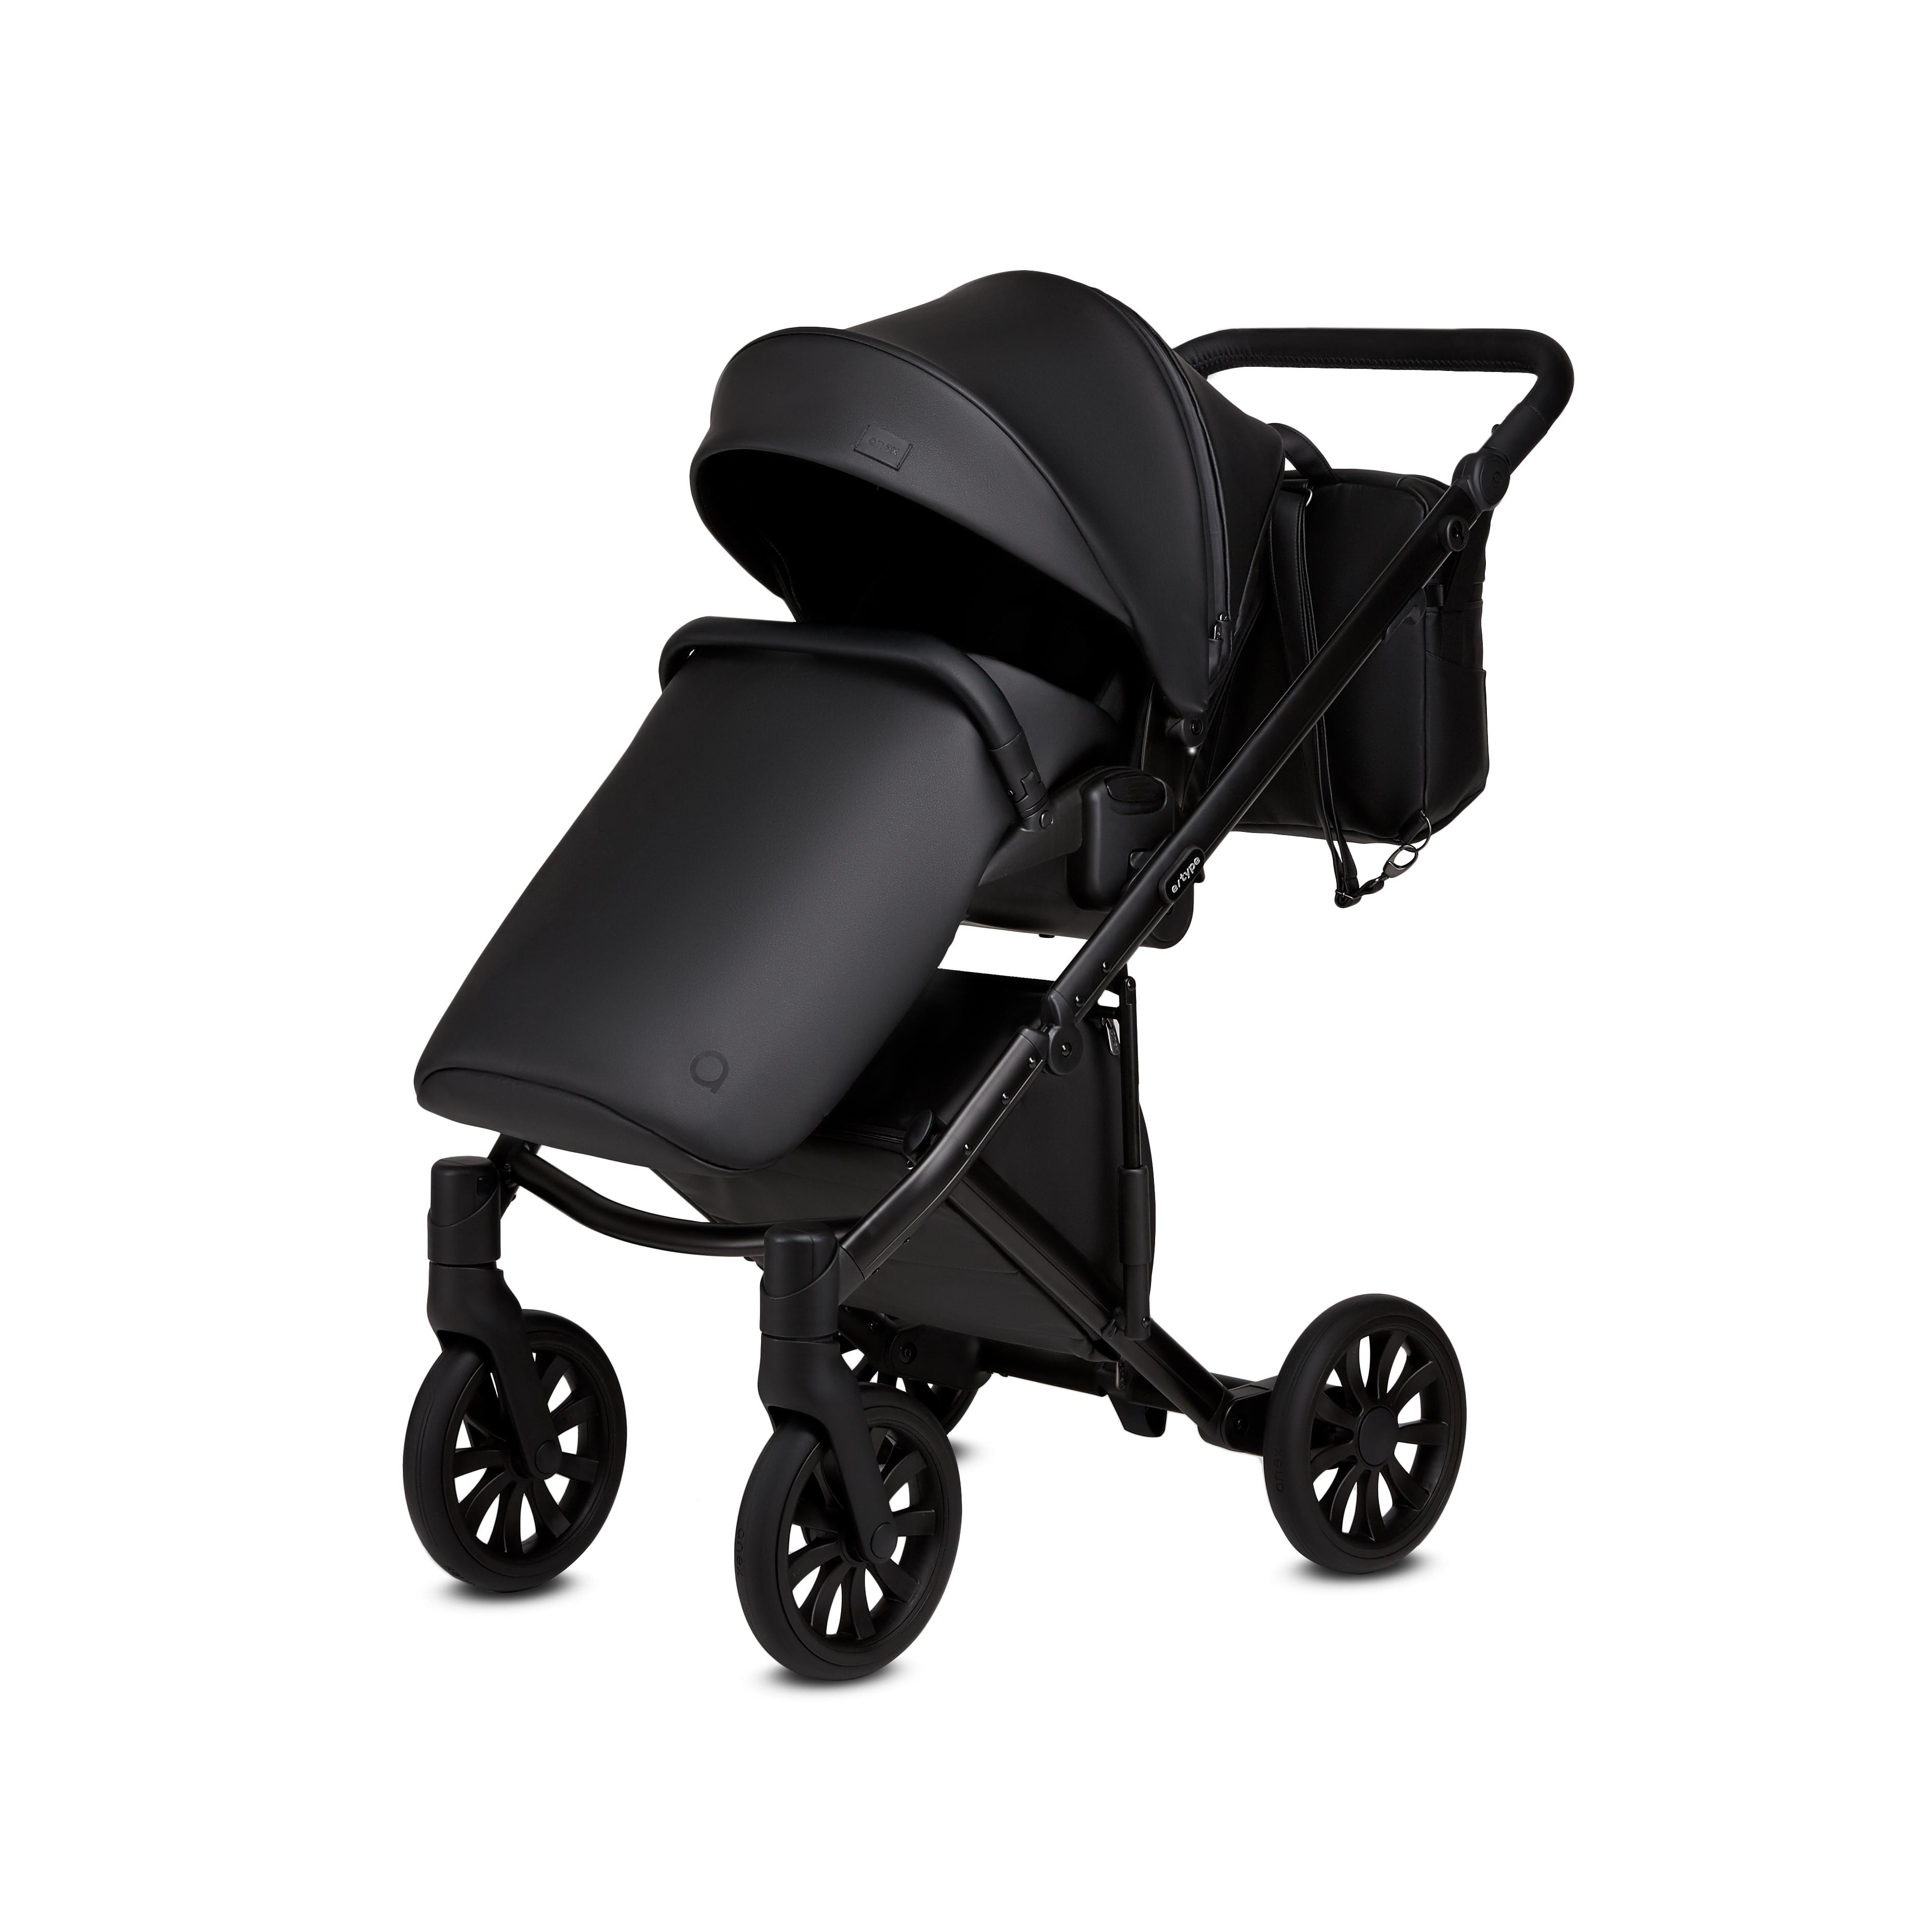 anex baby e type noir black eco leather stroller